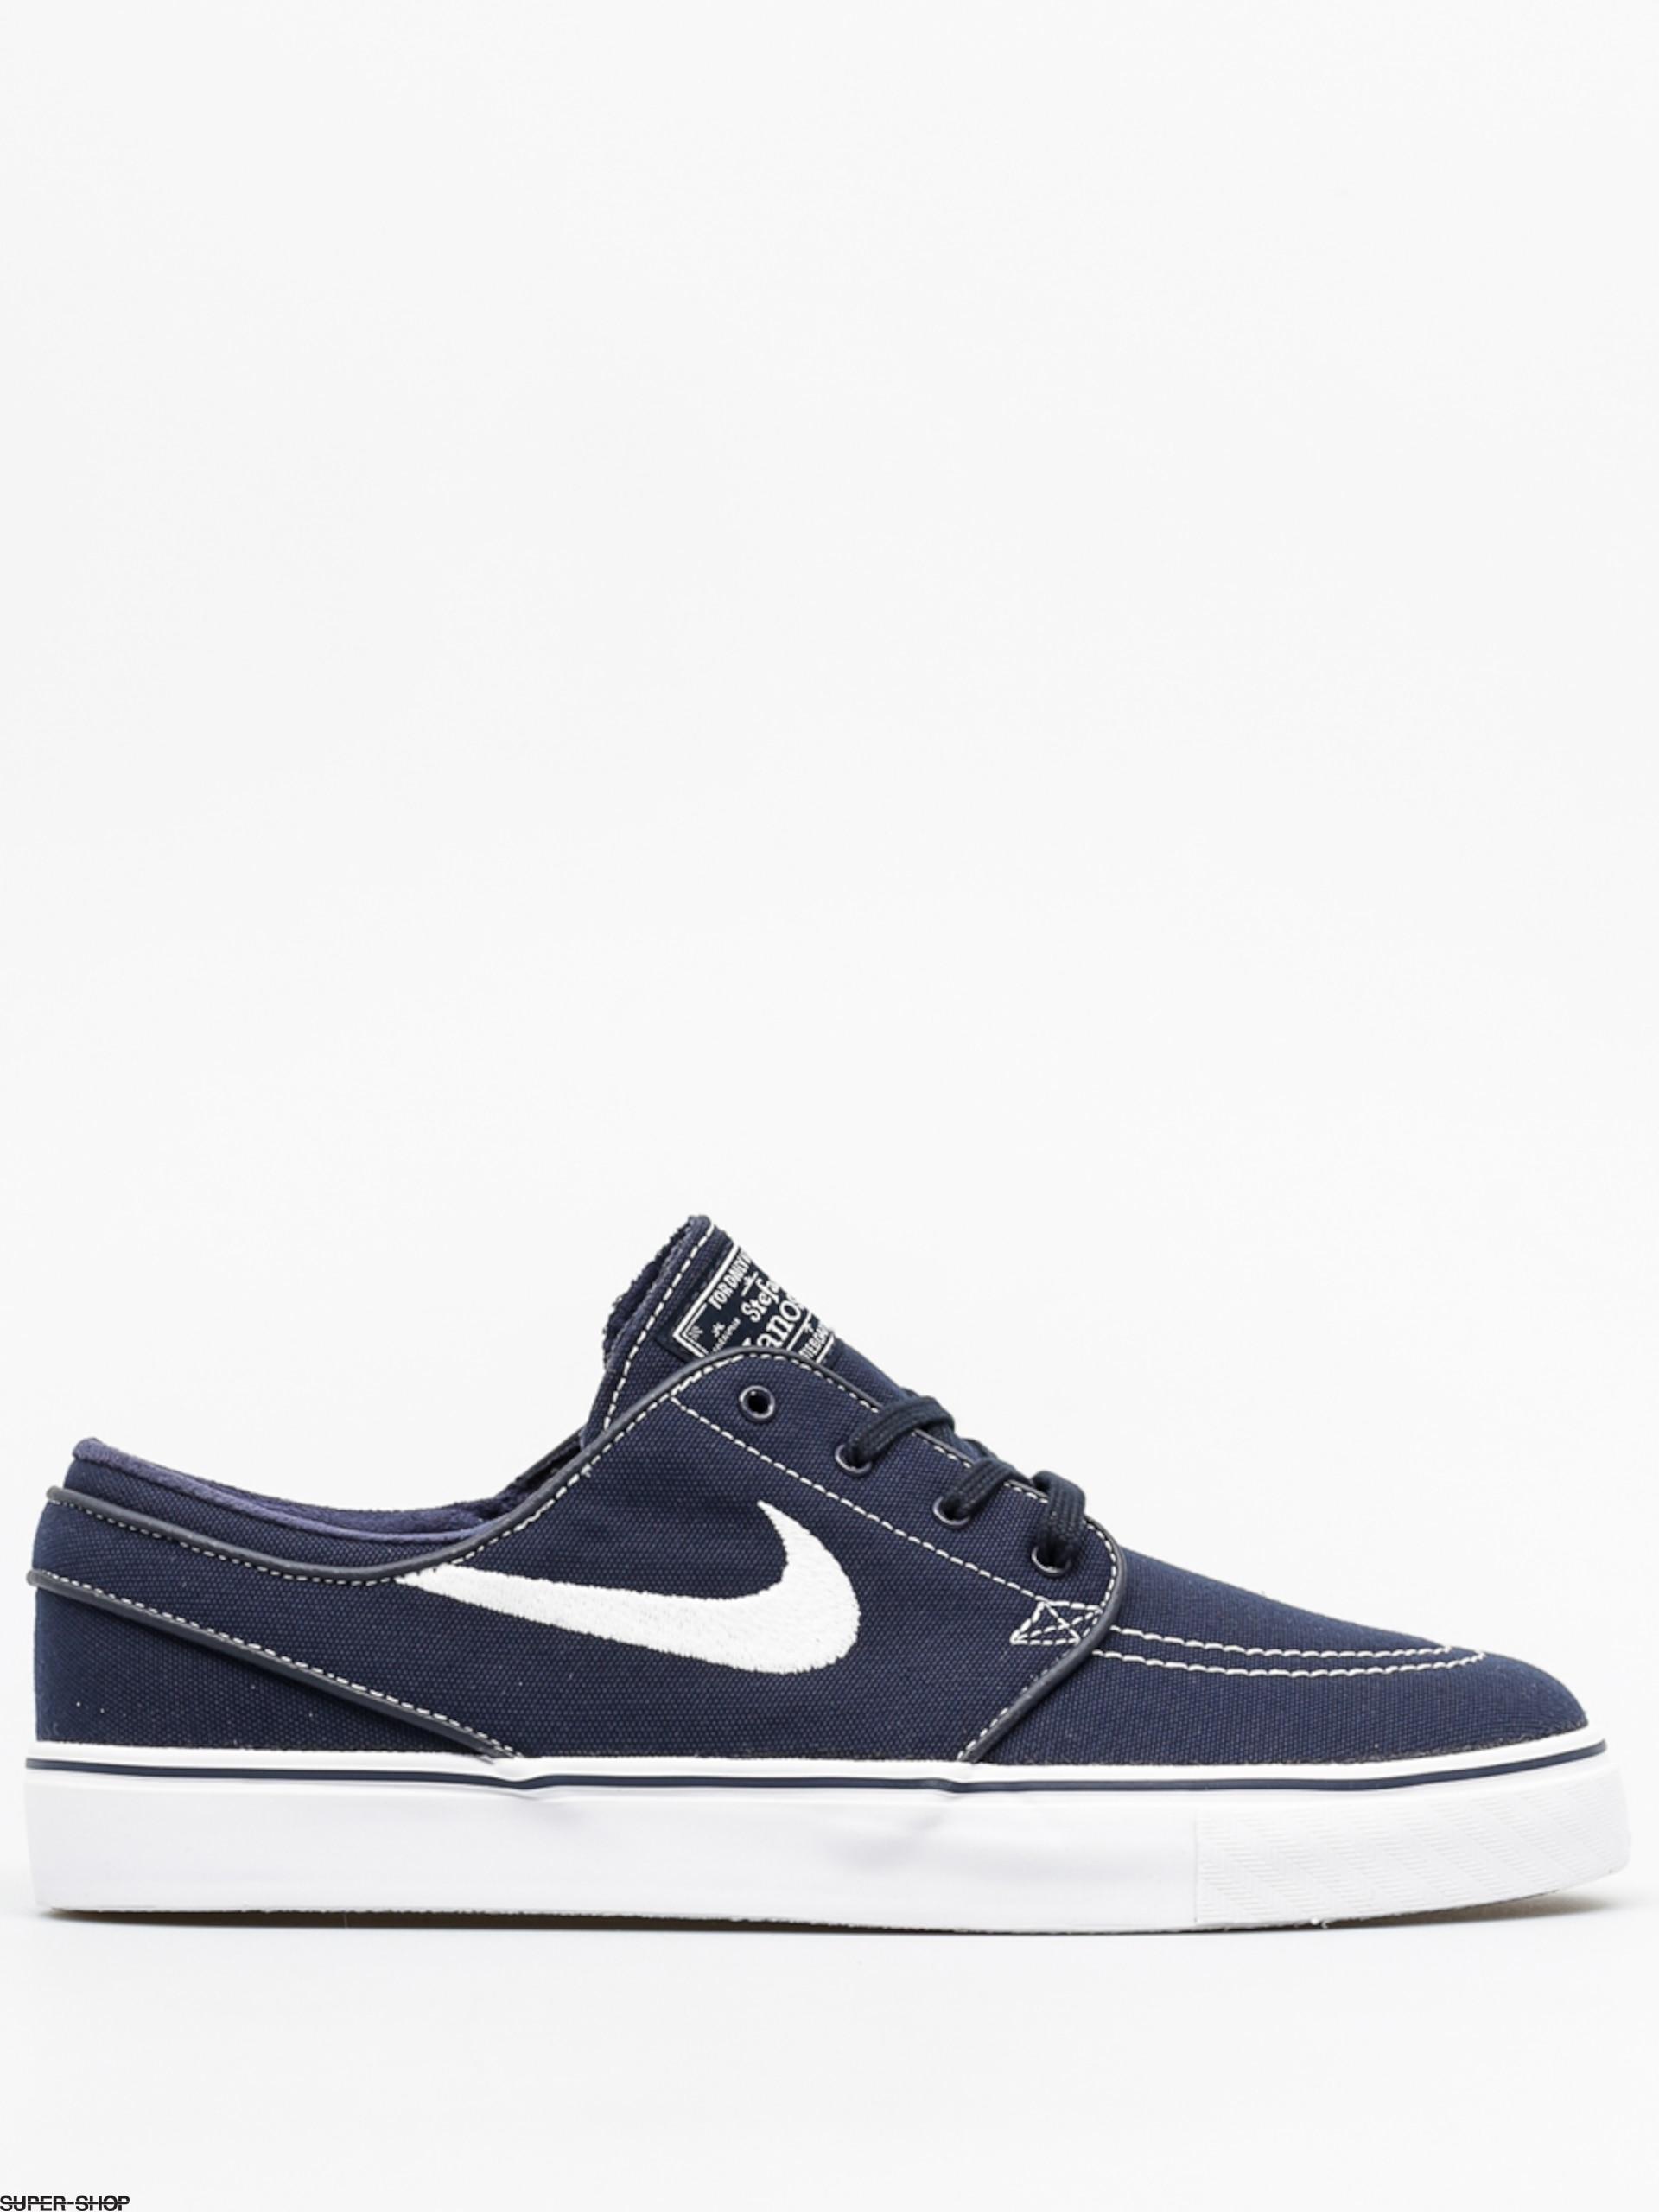 so cheap buy good size 7 Nike SB Schuhe Zoom Stefan Janoski Cnvs (obsidian/white gum light brown)